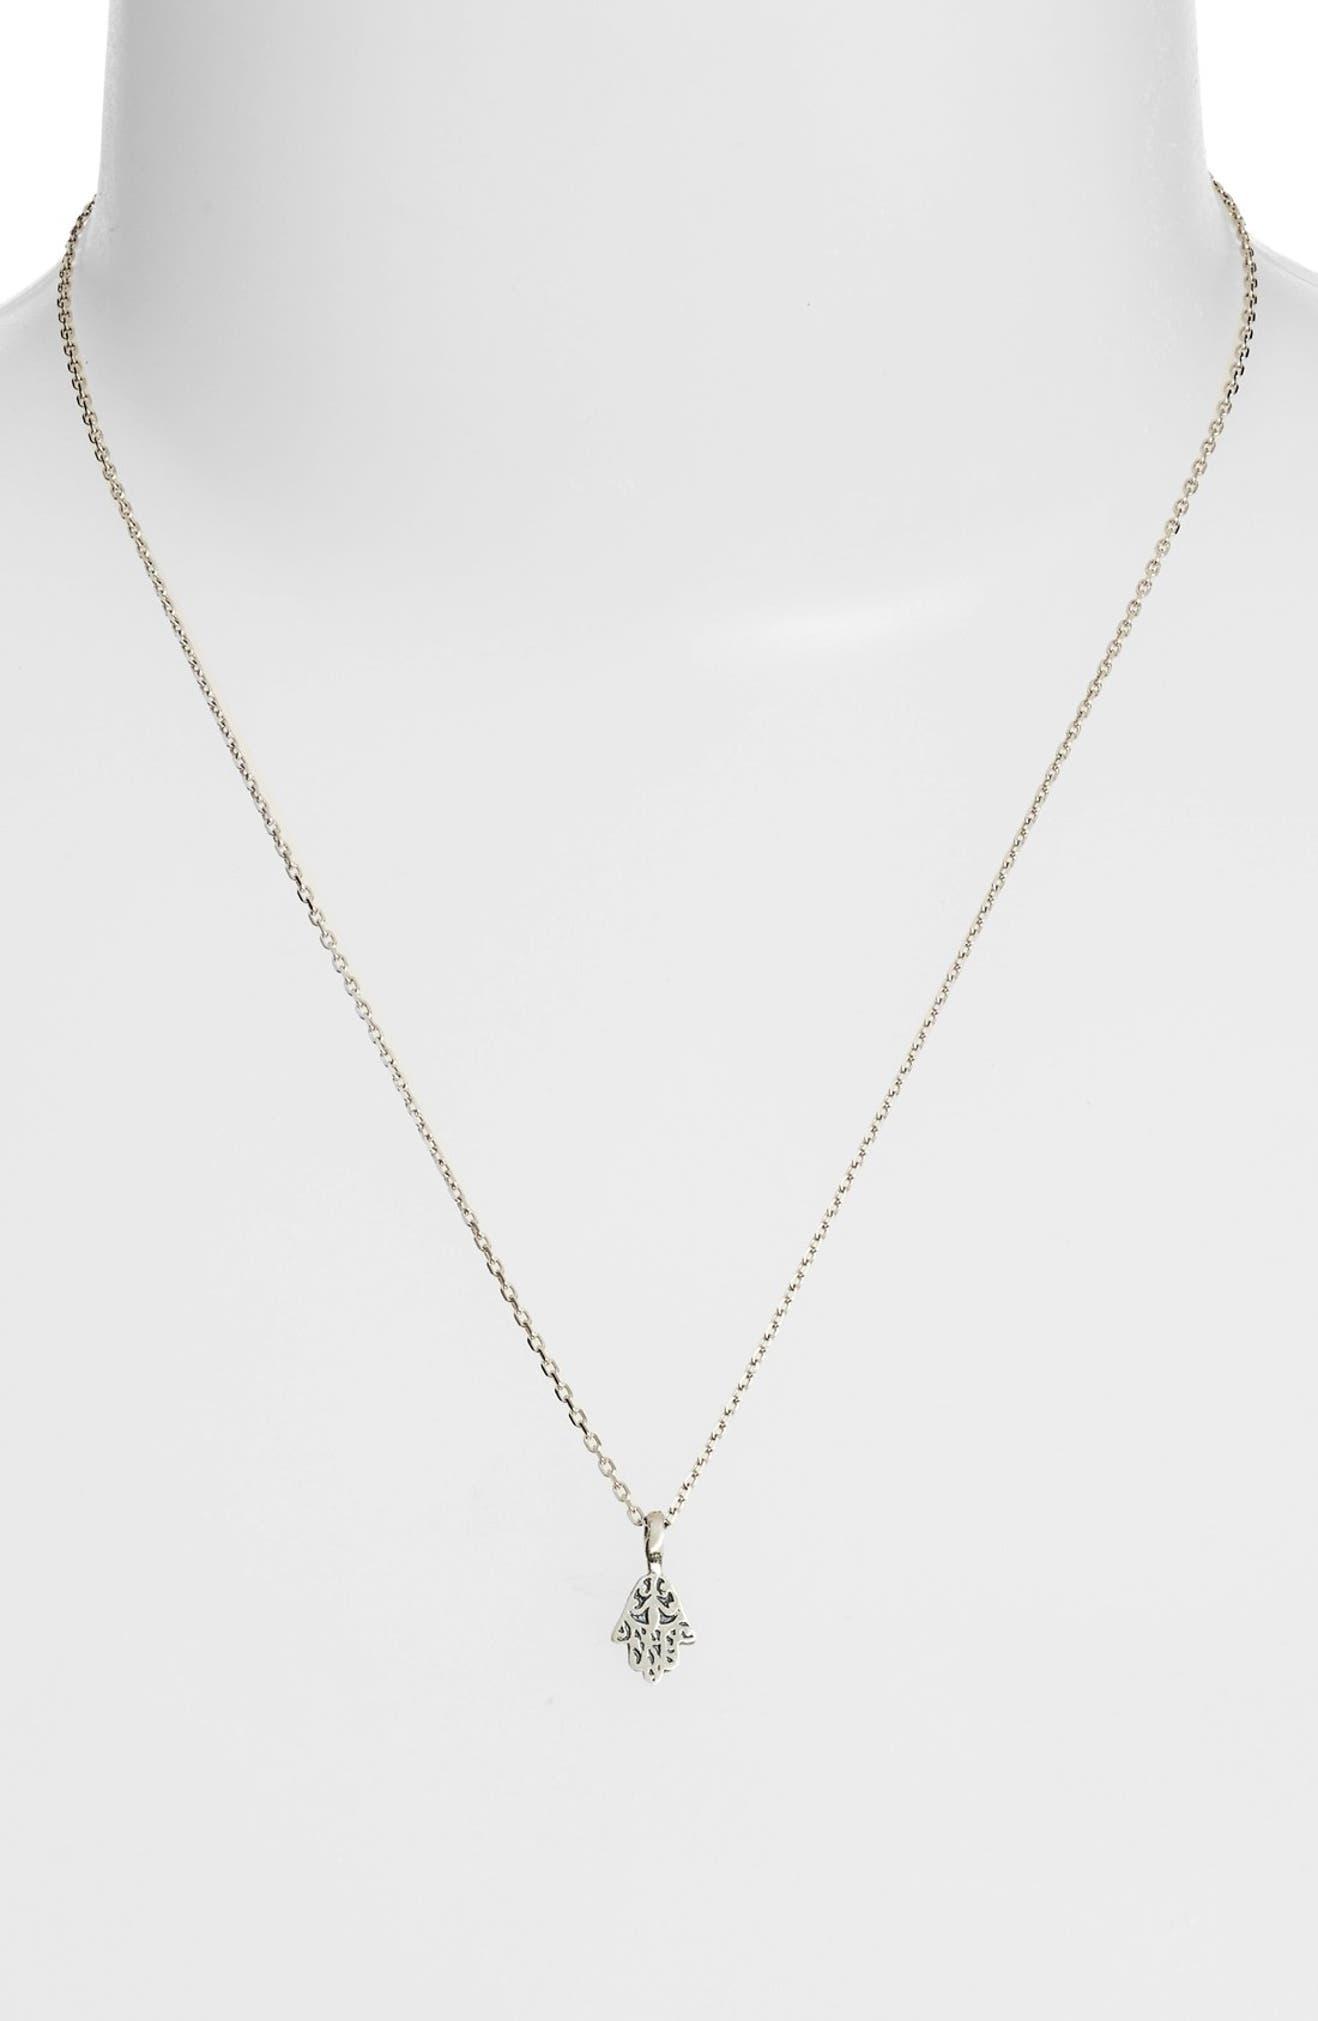 Satya Jewelry Hamsa Pendant Necklace | Nordstrom